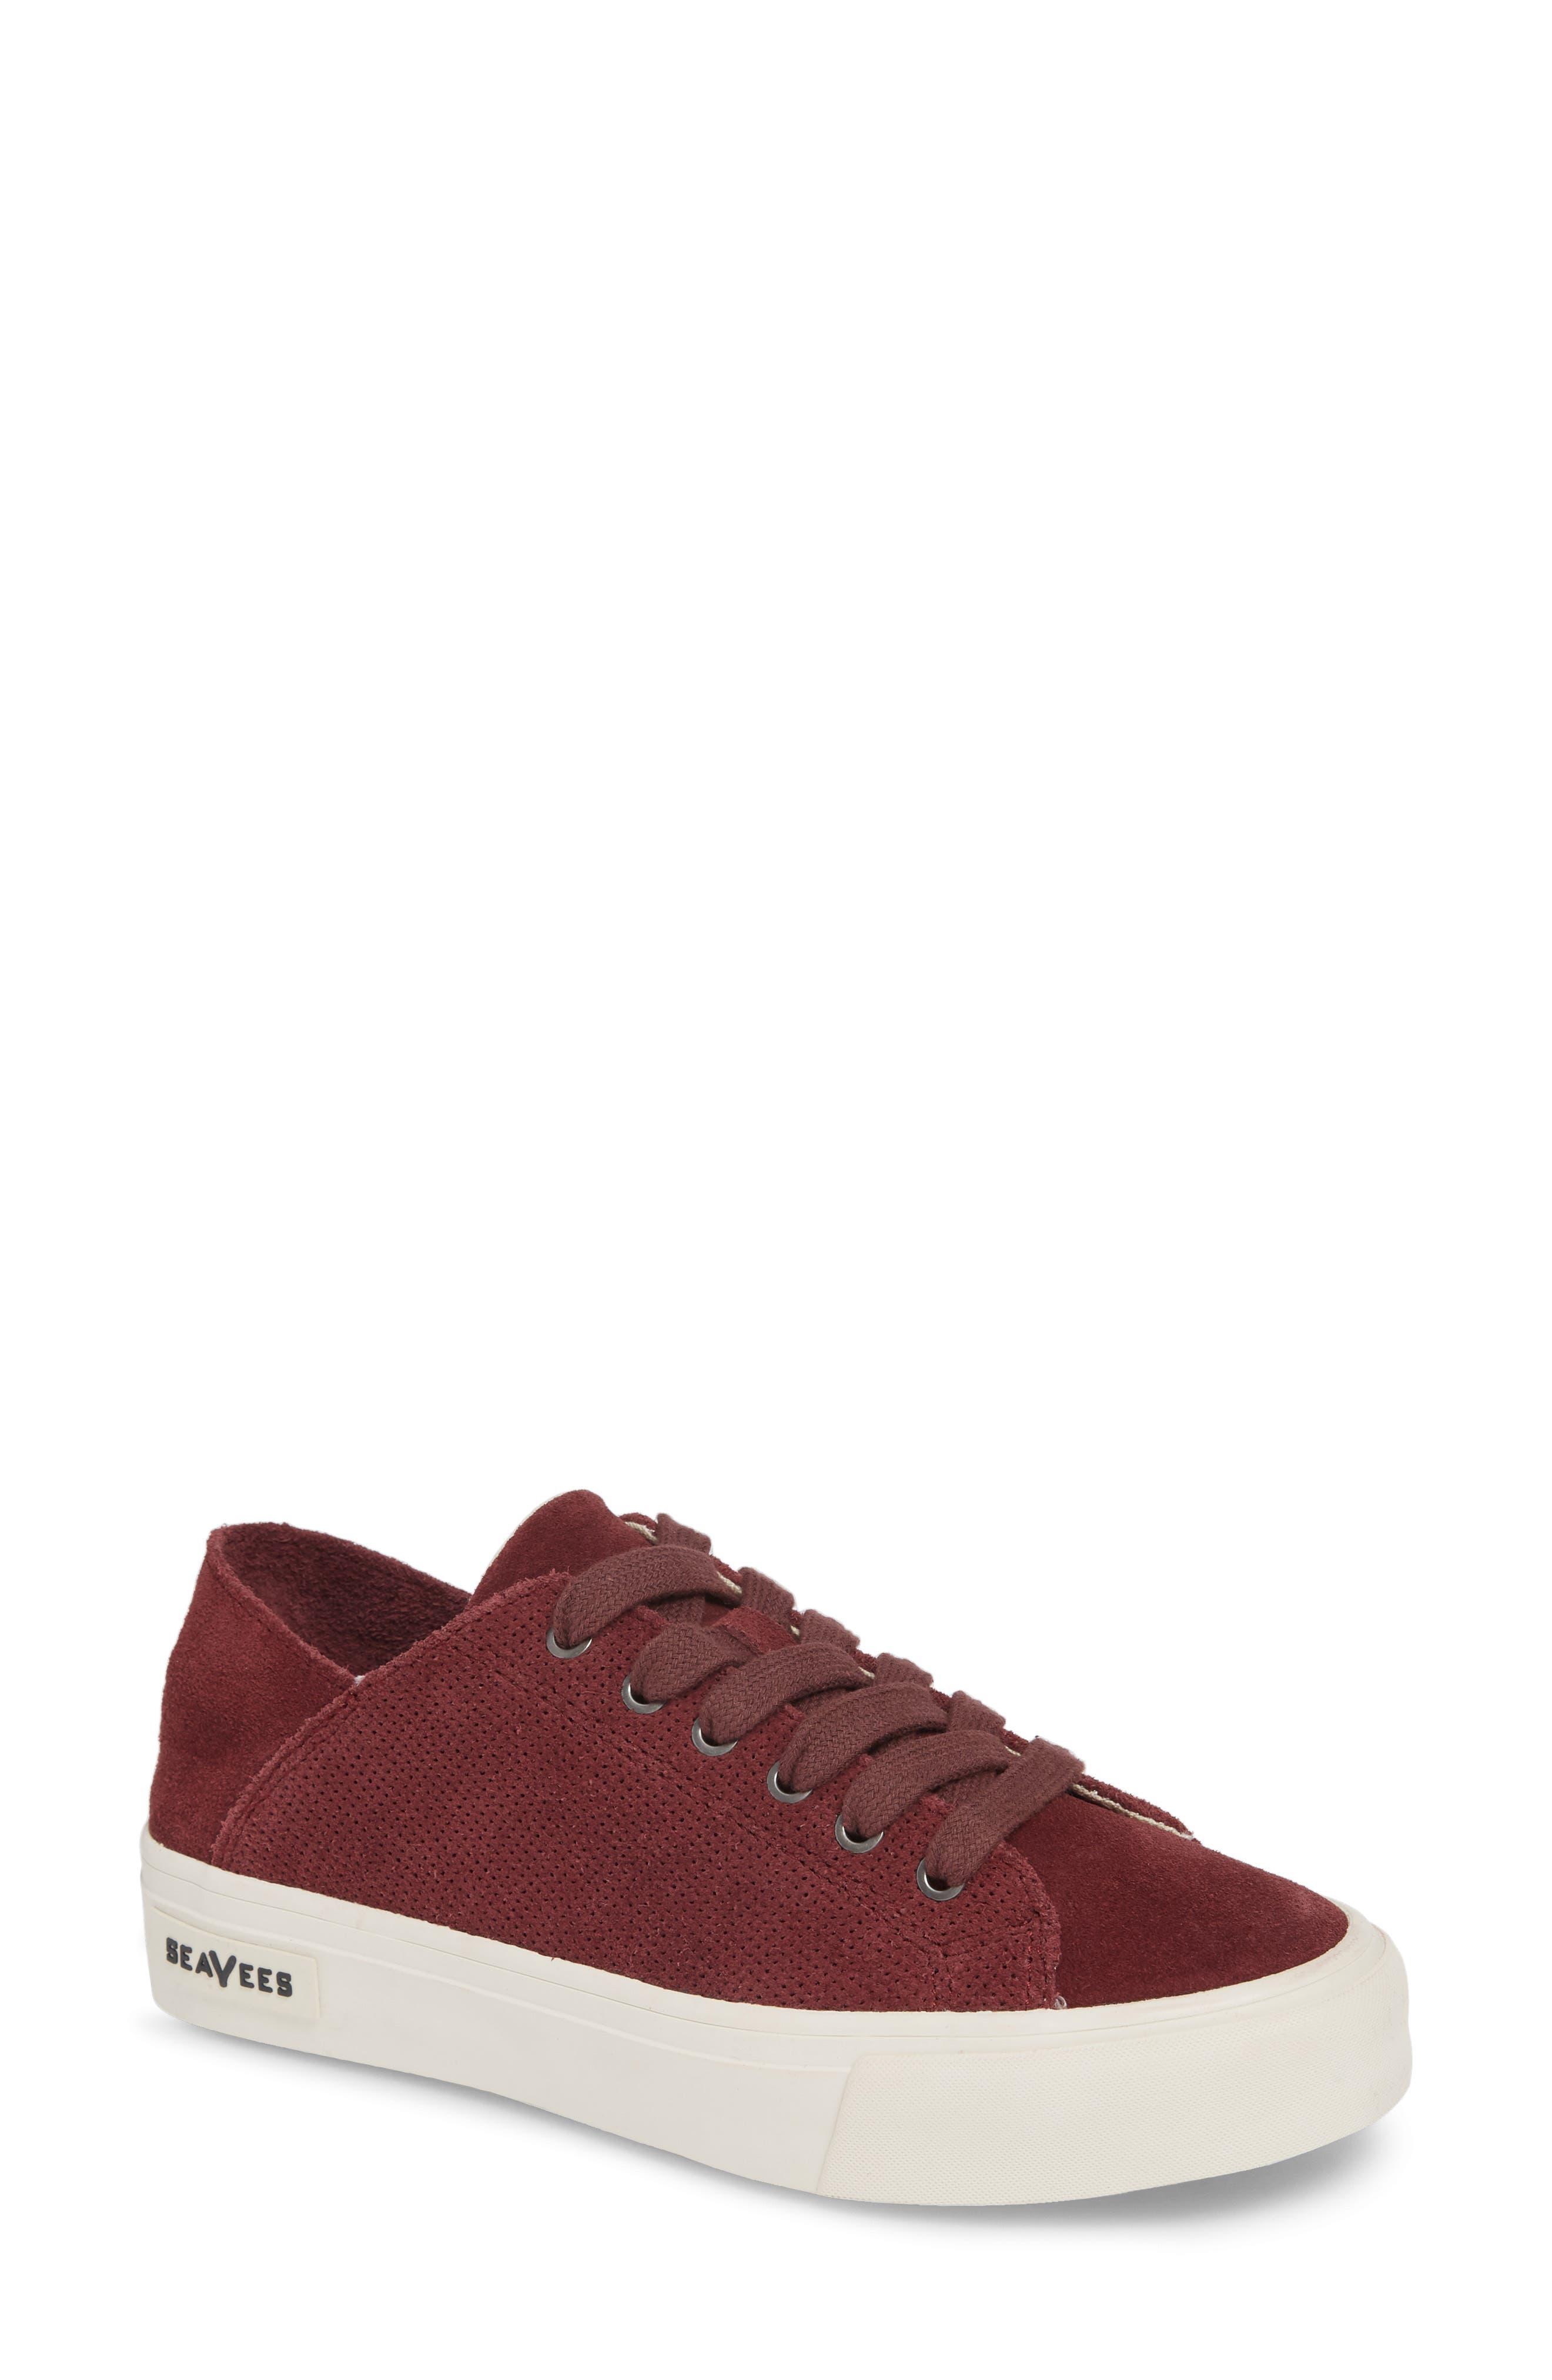 Sausalito Sneaker,                         Main,                         color, WINE